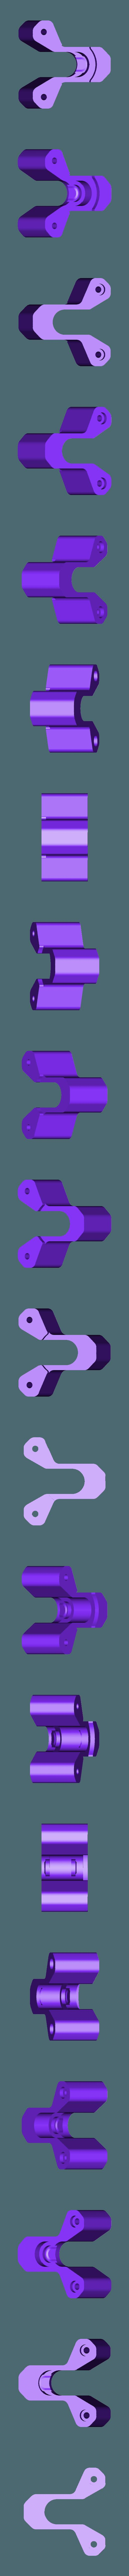 Gearhead_v2-0_97.STL Download free STL file Extruder Mount (Printrbot Gear Head) • 3D printable design, WalterHsiao